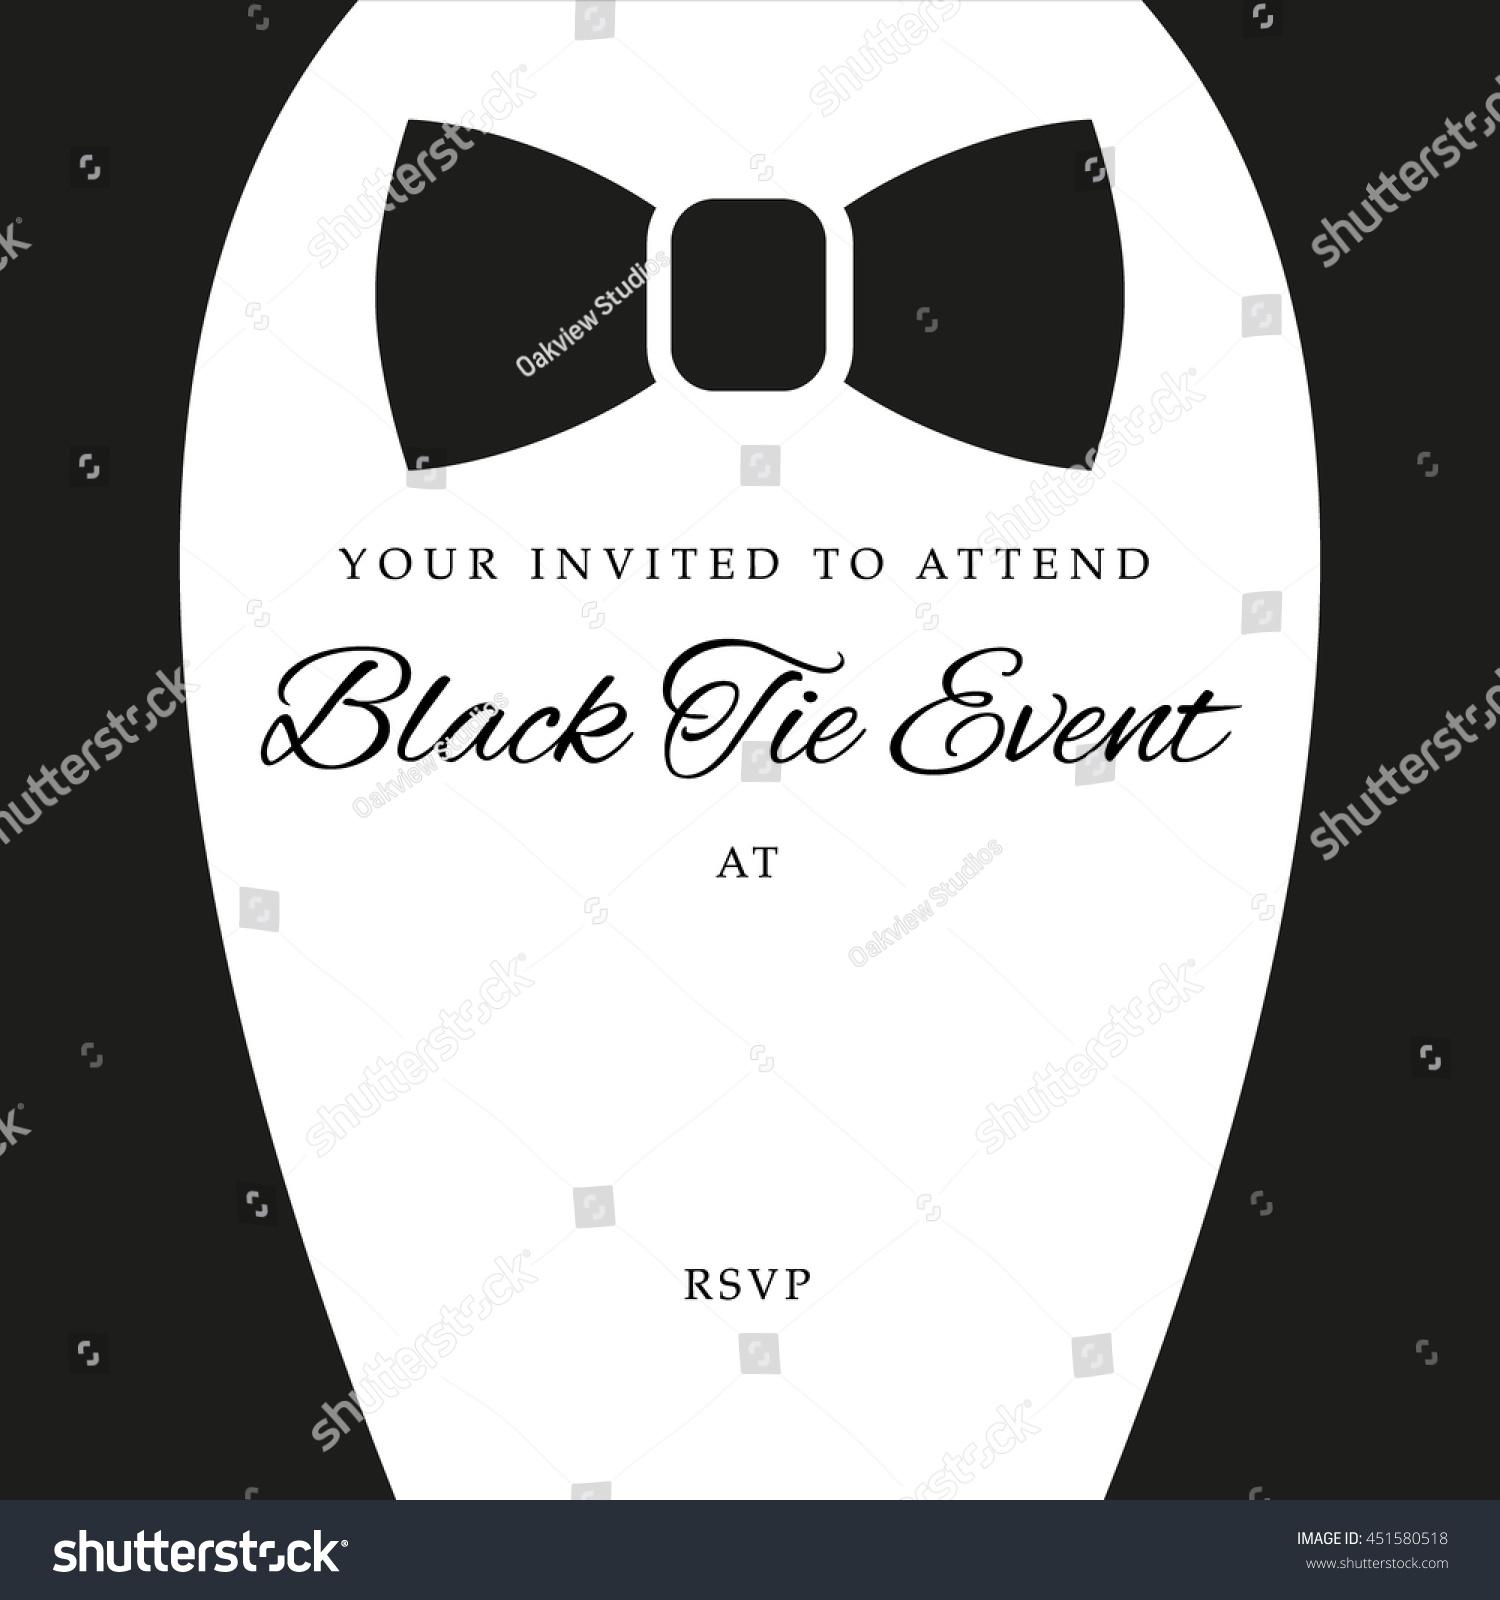 black tie event invite template vector 451580518 shutterstock. Black Bedroom Furniture Sets. Home Design Ideas